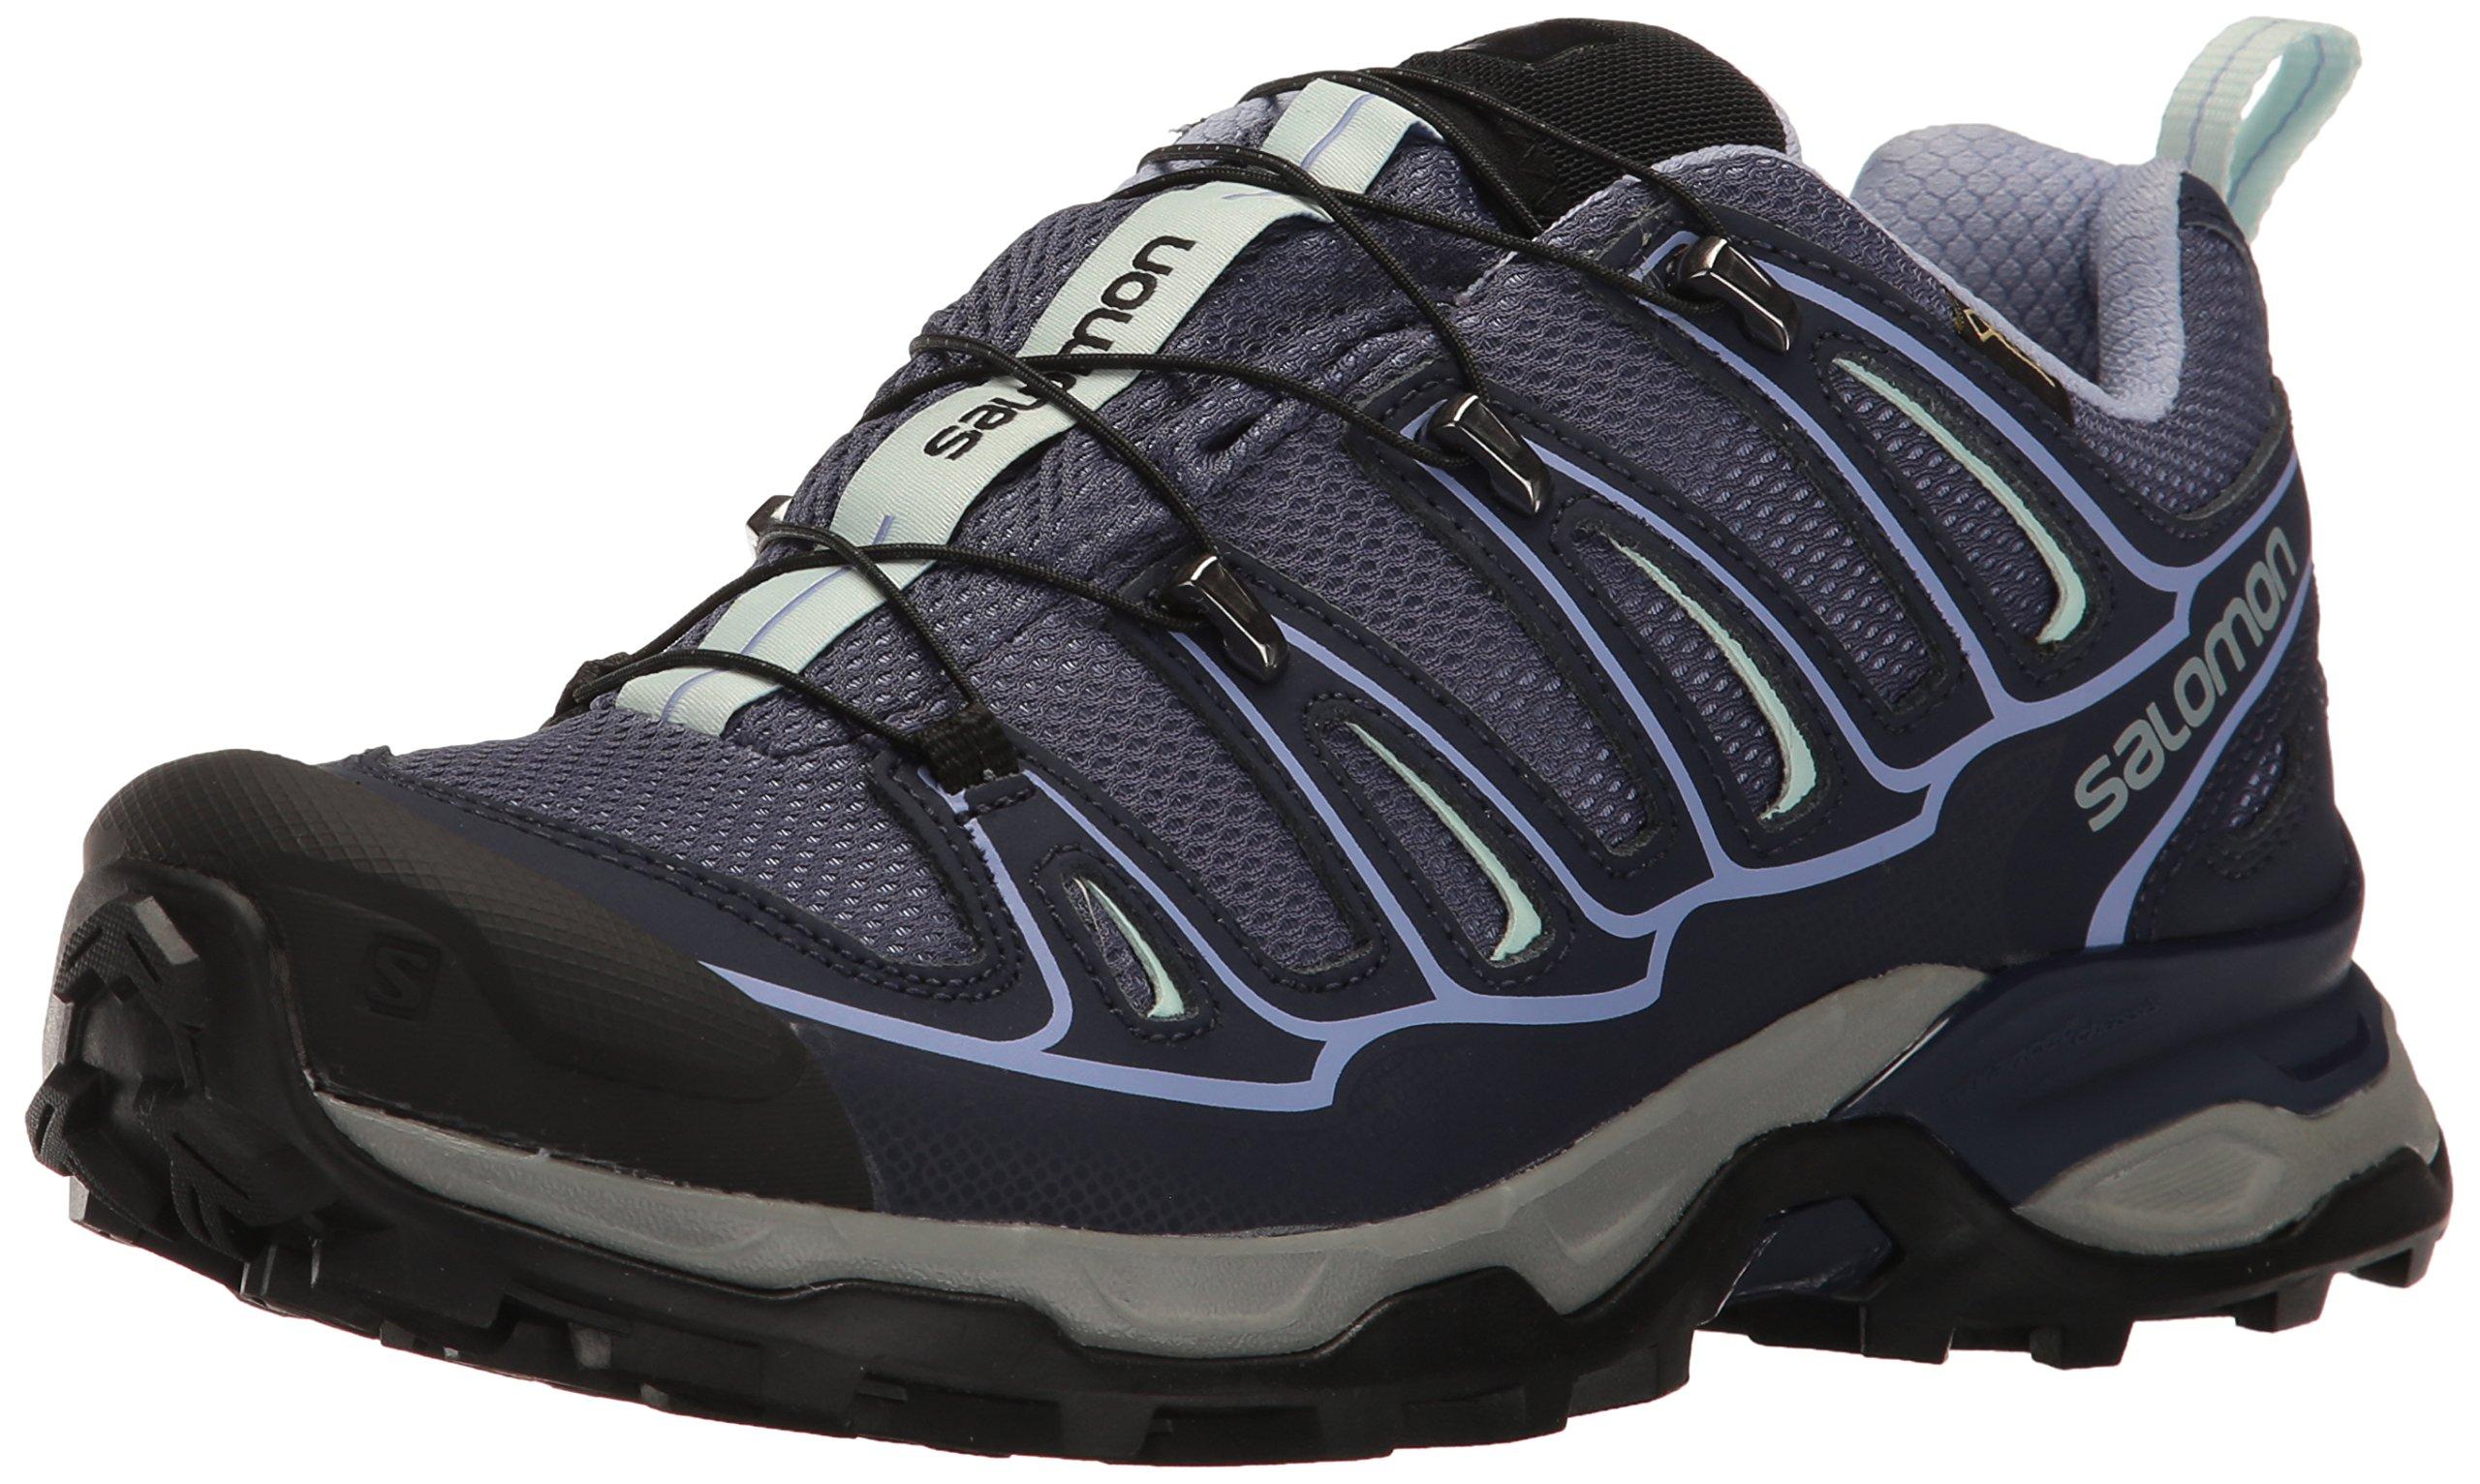 Salomon Women's X Ultra 2 Gtx W Hiking Shoe, Crown Blue/Evening Blue/Easter Egg, 6.5 M US